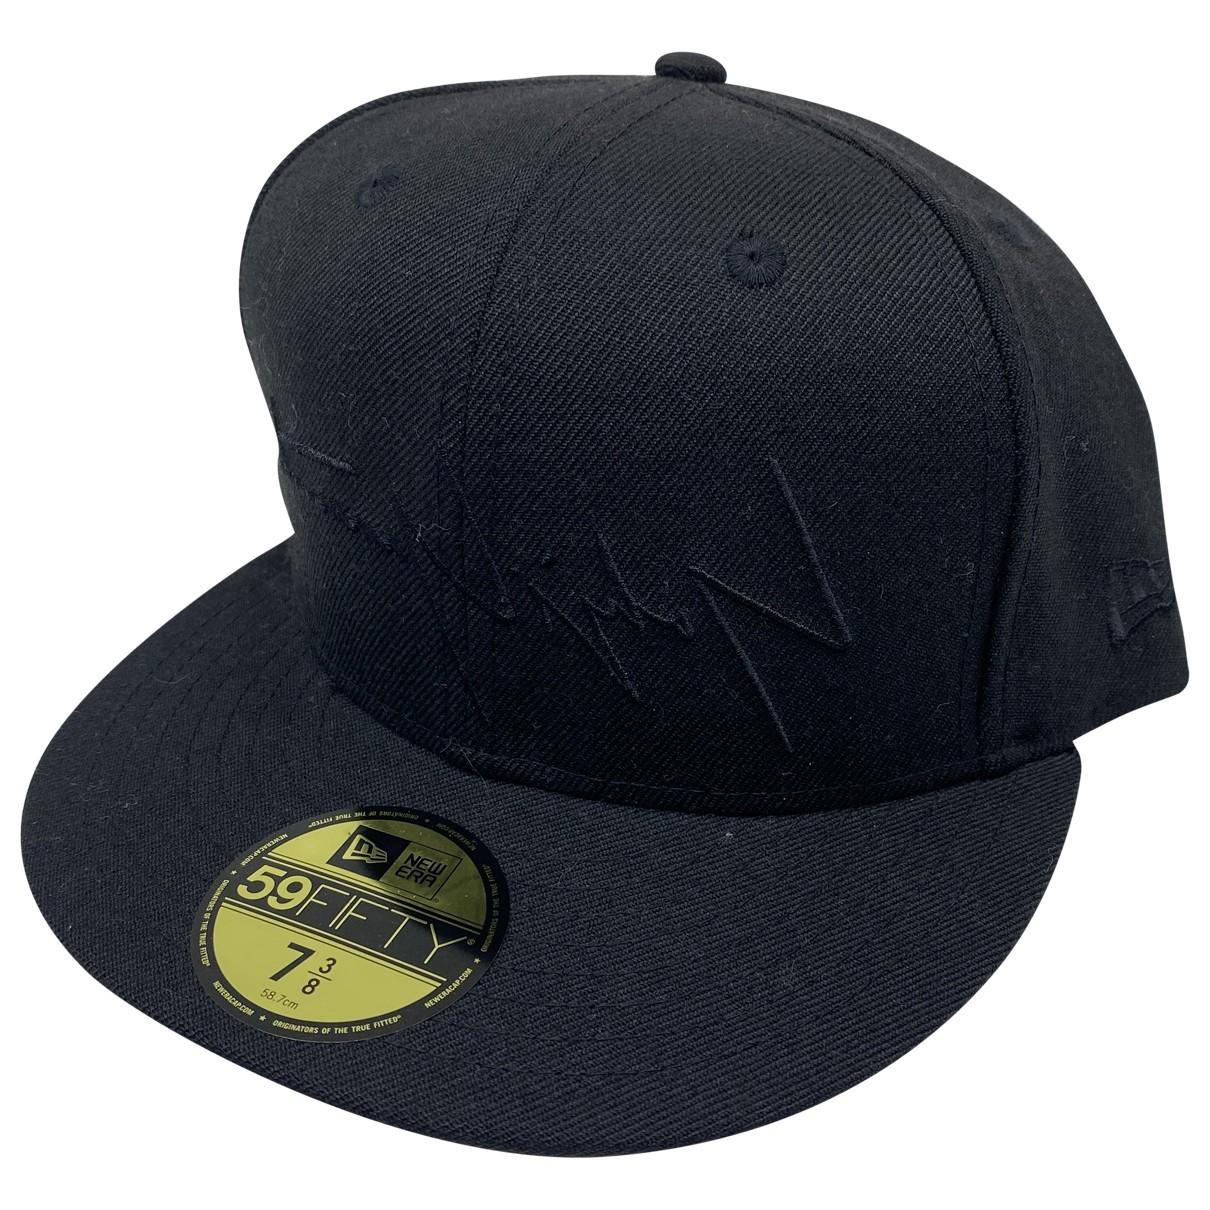 Yohji Yamamoto \N Black Cotton hat & pull on hat for Men 59 cm